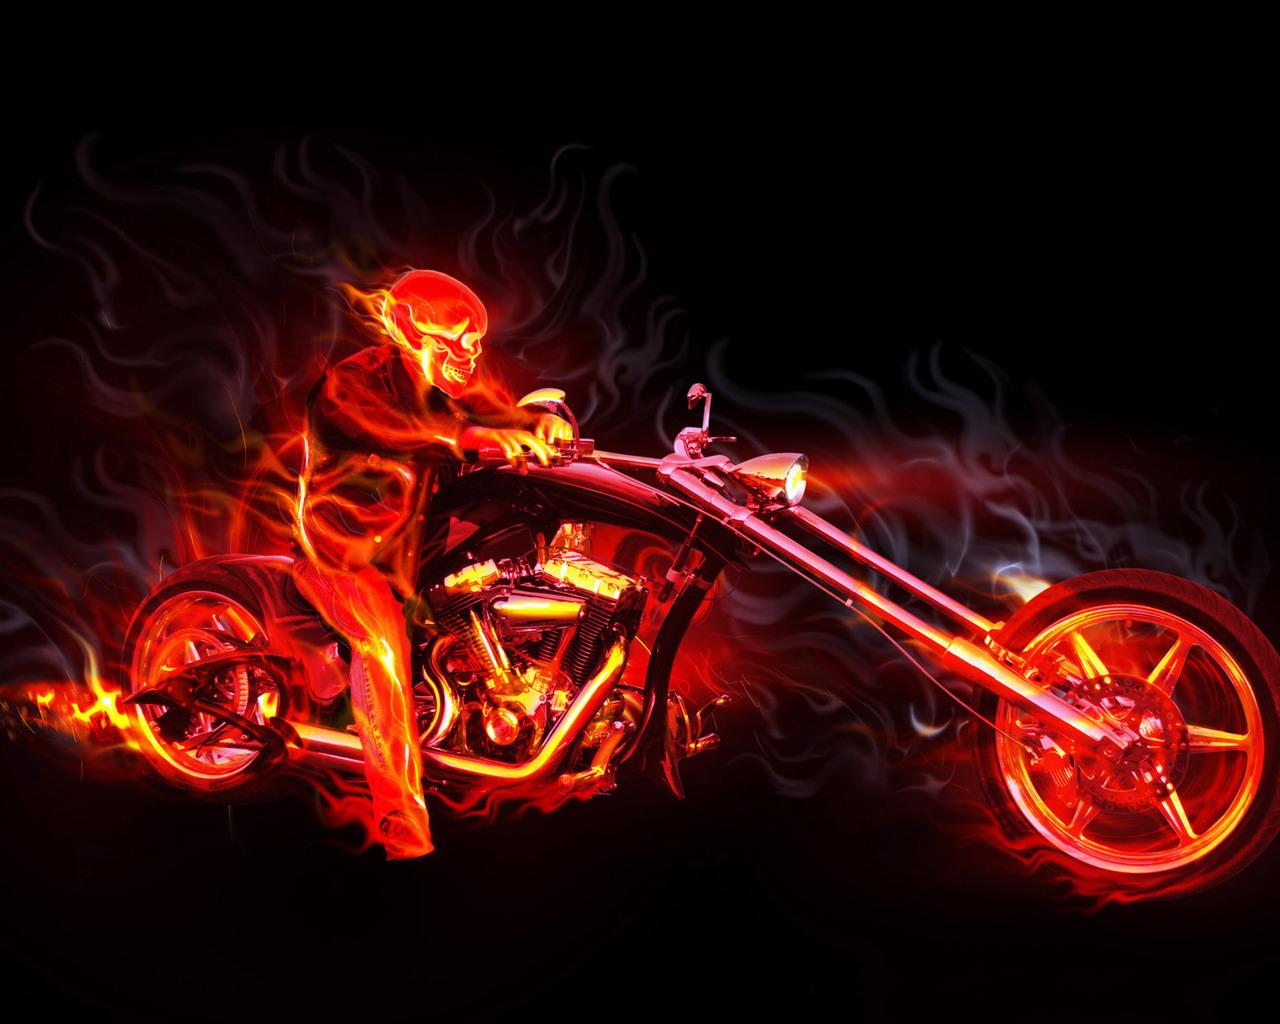 Dessins en couleurs  imprimer  Ghost Rider numro  21839